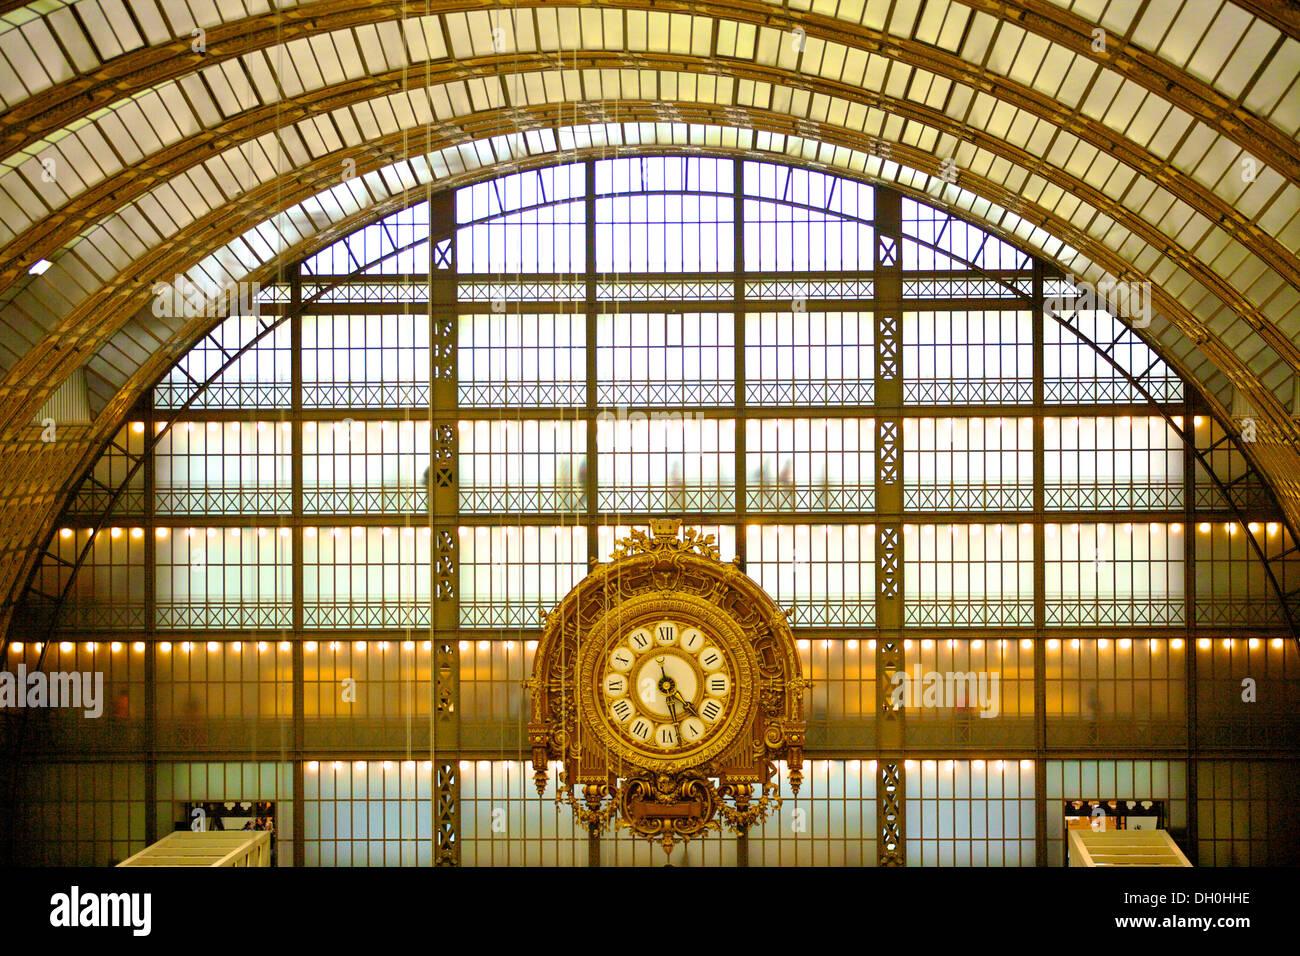 Musee d'Orsay Clock, Paris, France - Stock Image